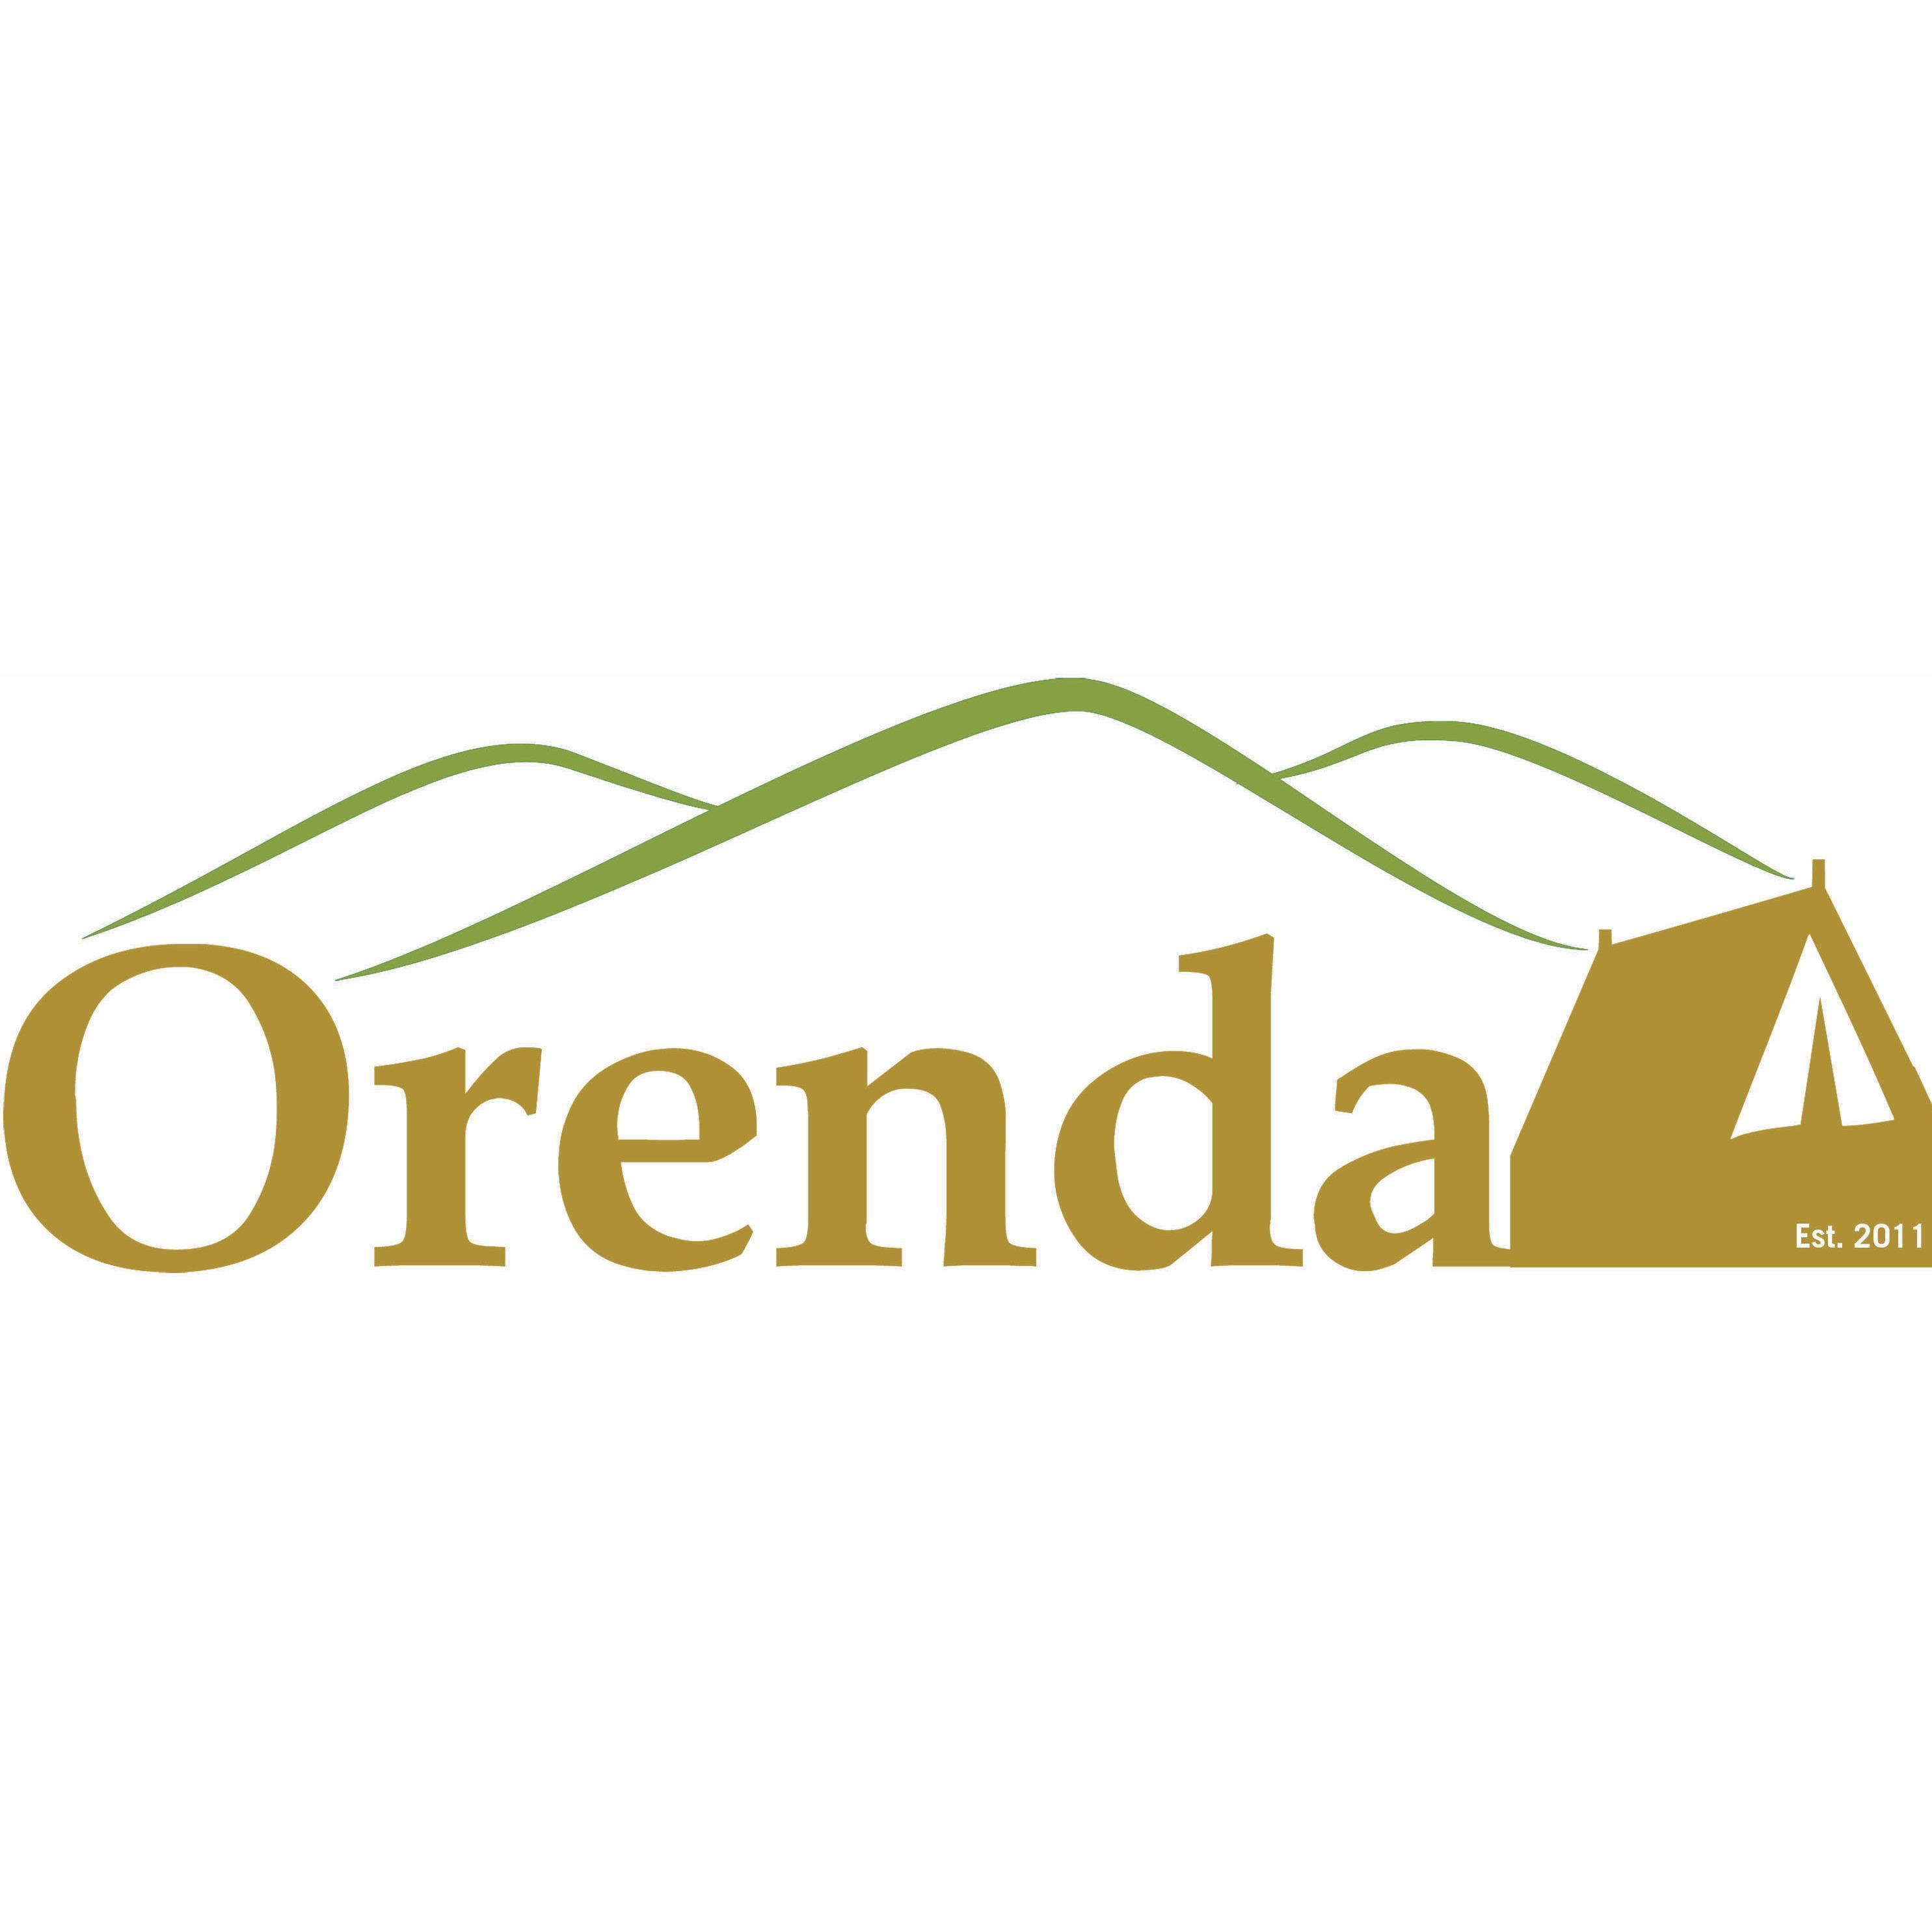 Camp Orenda Ltd